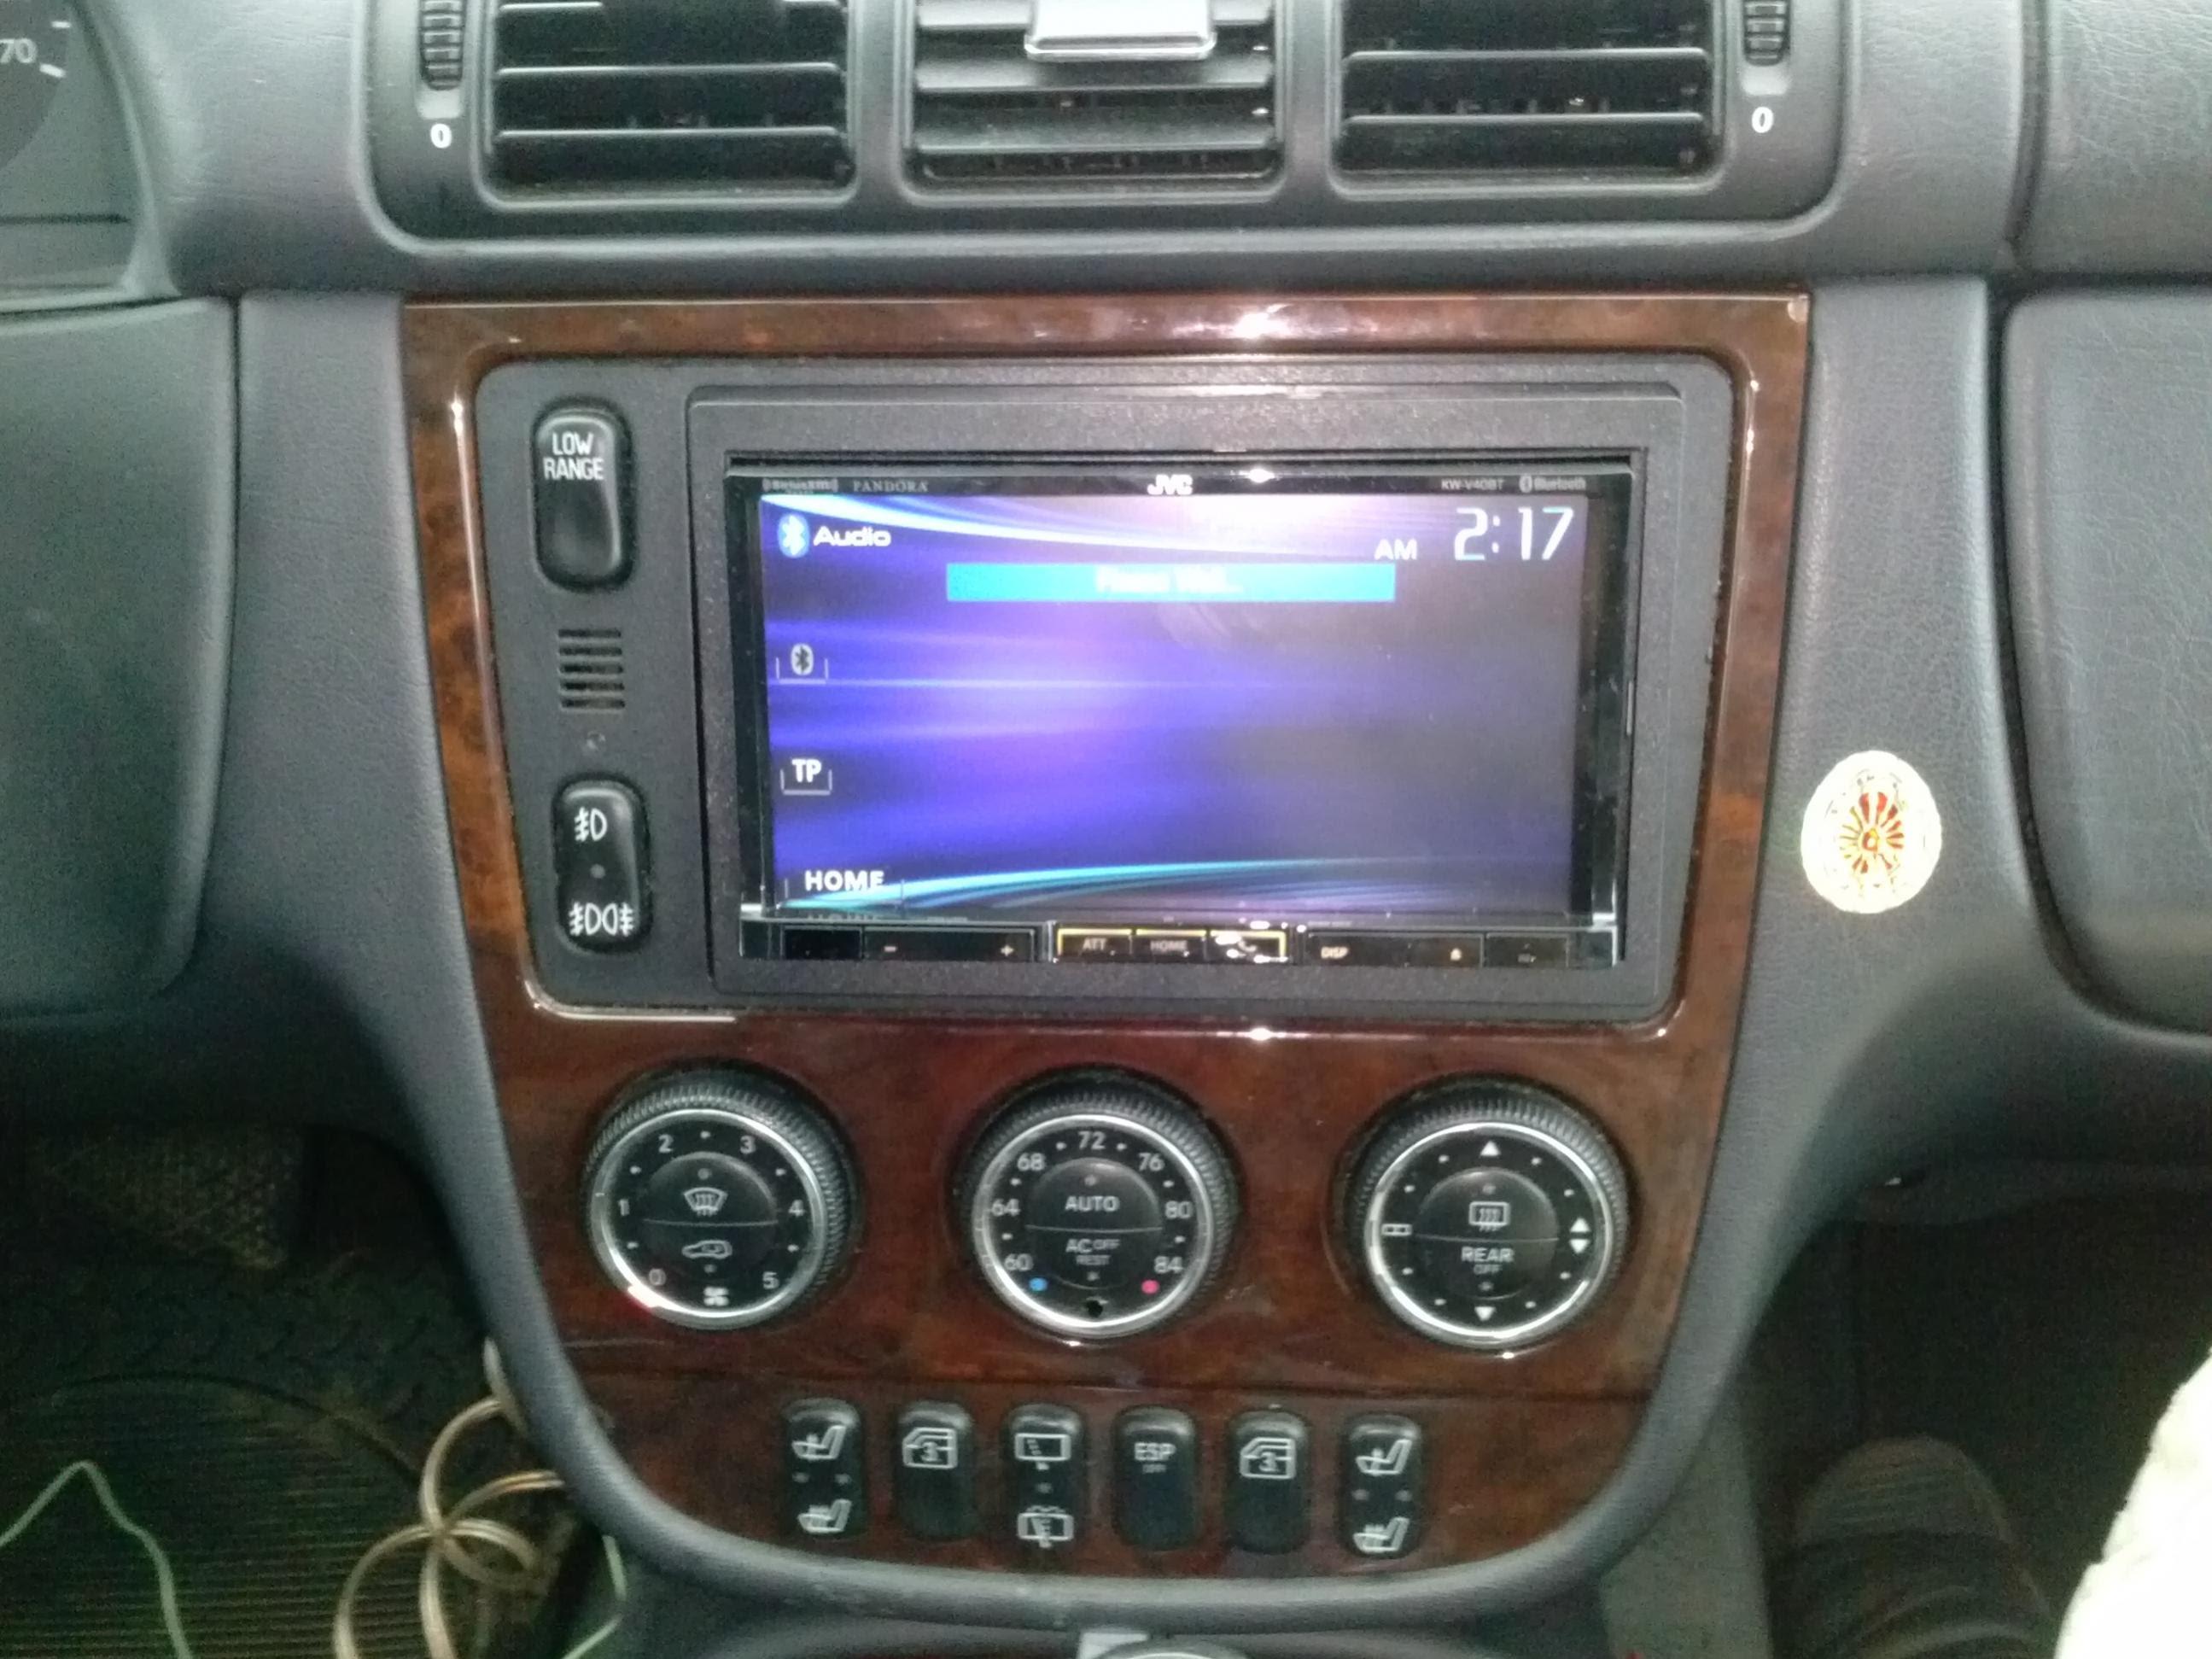 2003 Mercedes Ml350 Radio Wiring Diagram Toyota Pickup Alternator Wiring Diagram Begeboy Wiring Diagram Source